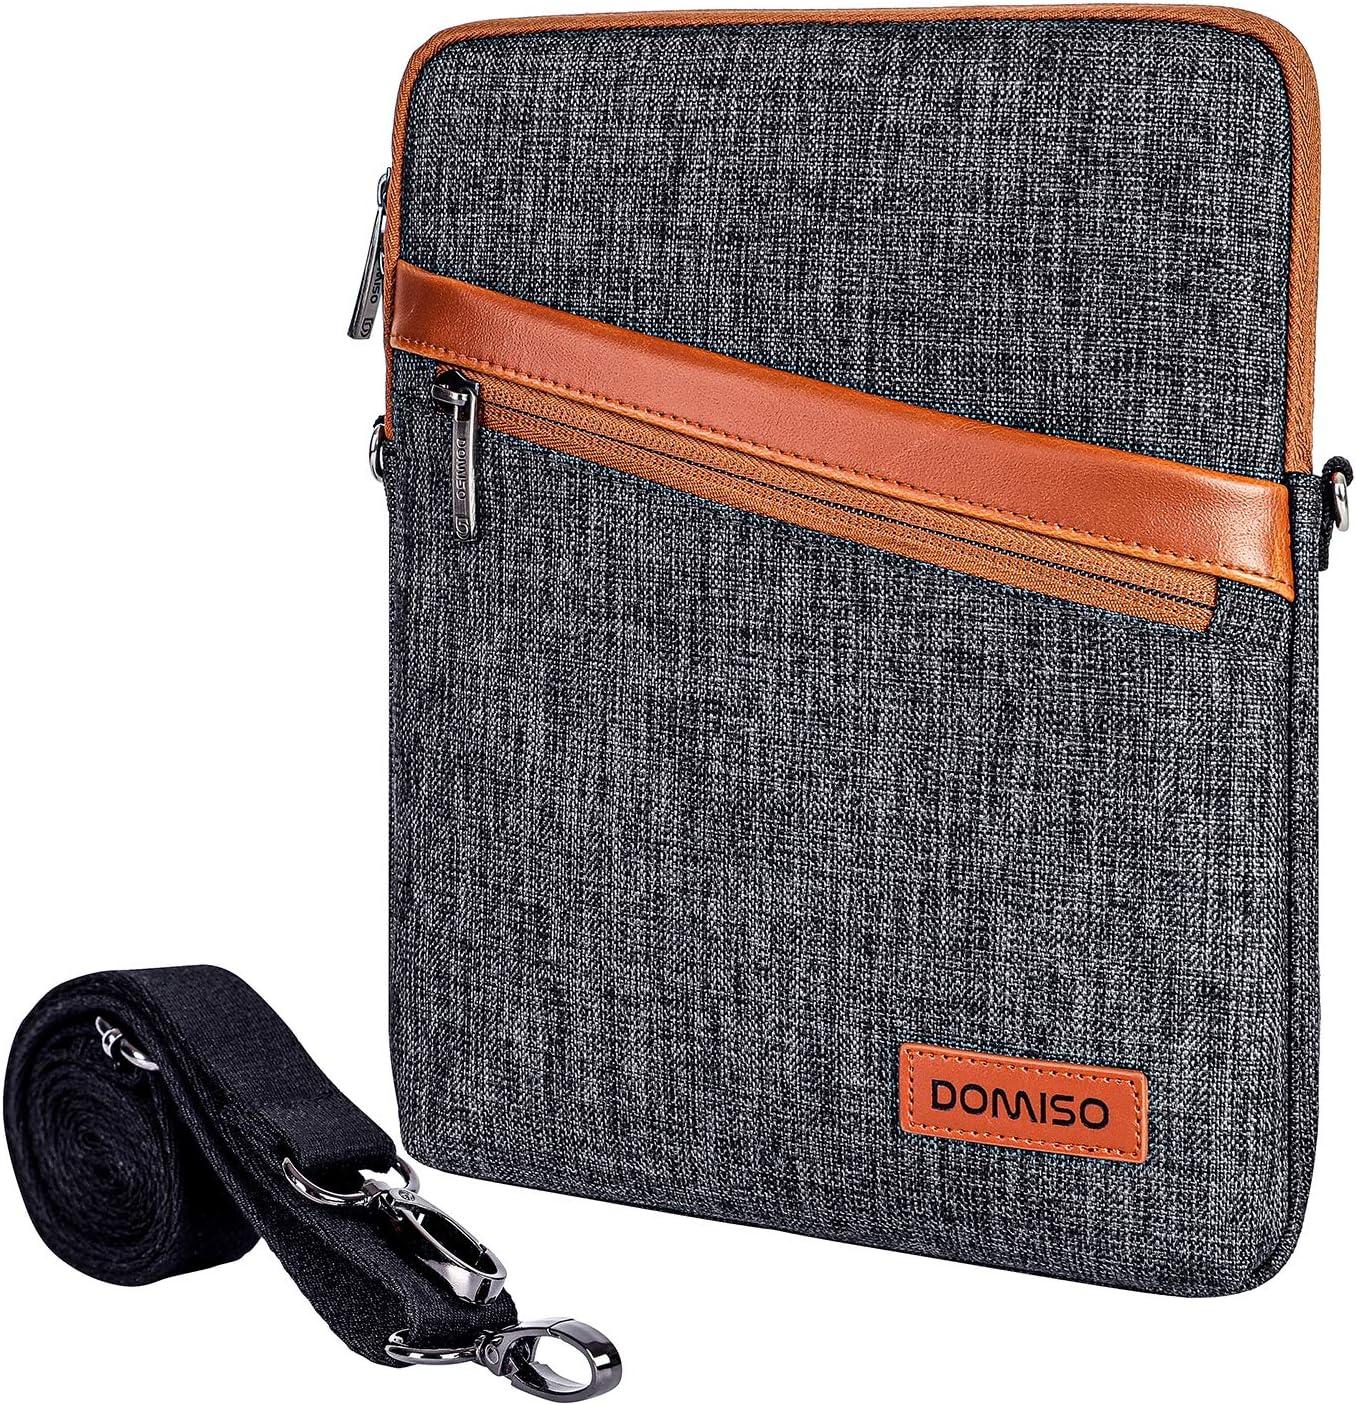 DOMISO 10 Inch Waterproof Shockproof Tablet Shoulder Bag iPad Sleeve Protective Case Clutch Bag for 9.7